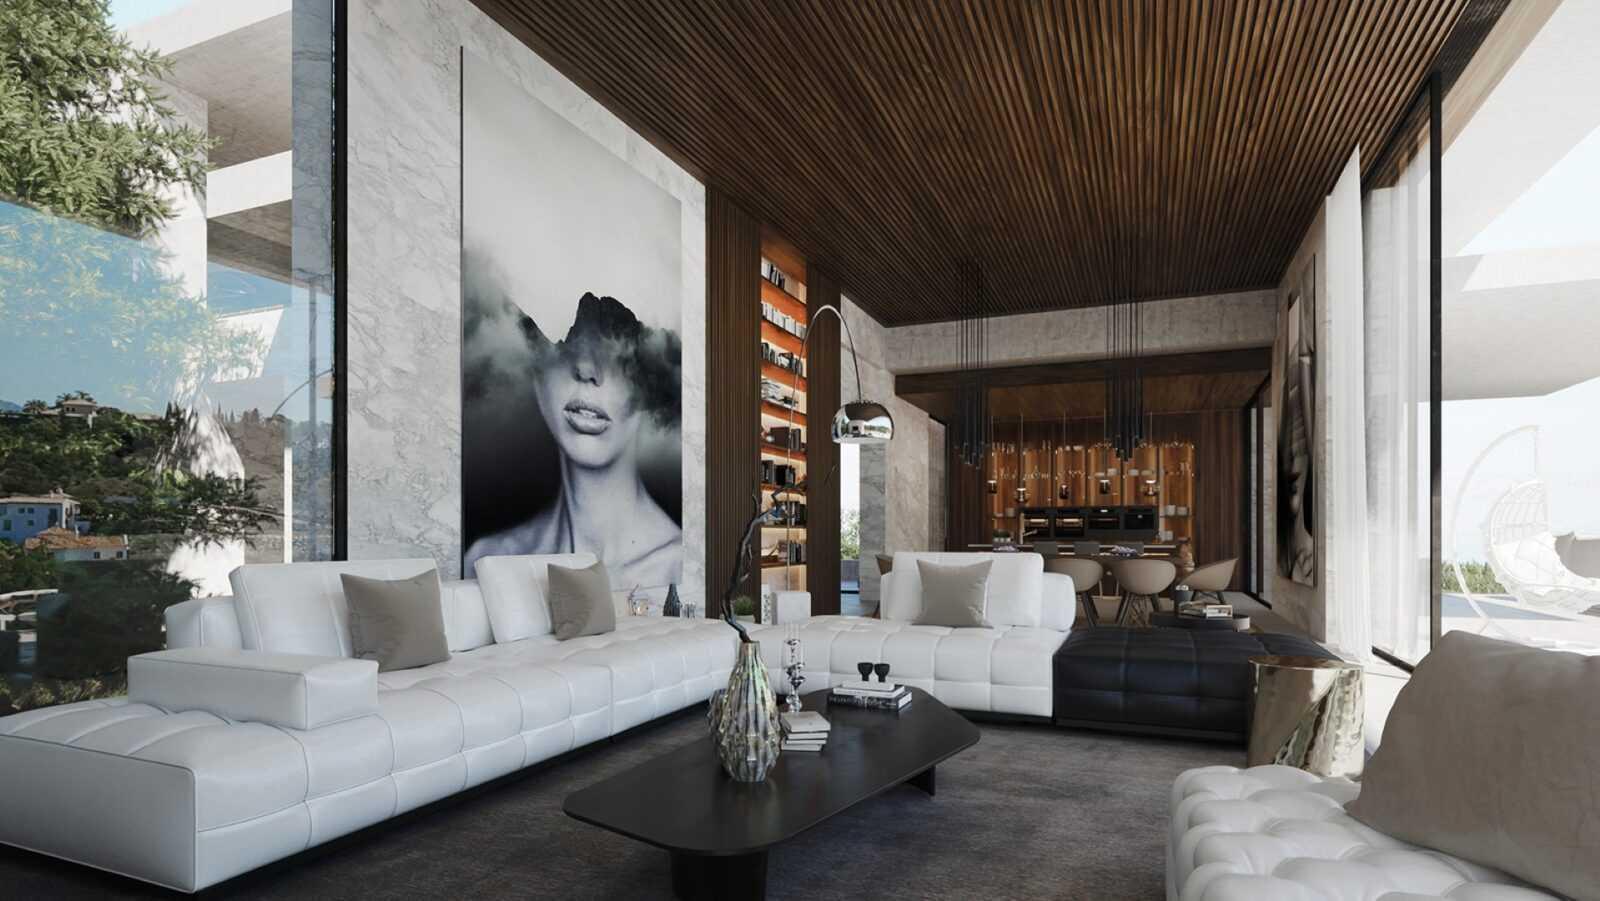 JC GATE infografias004 Large Virtualport3d luxury Properties in Marbella and Costa del Sol